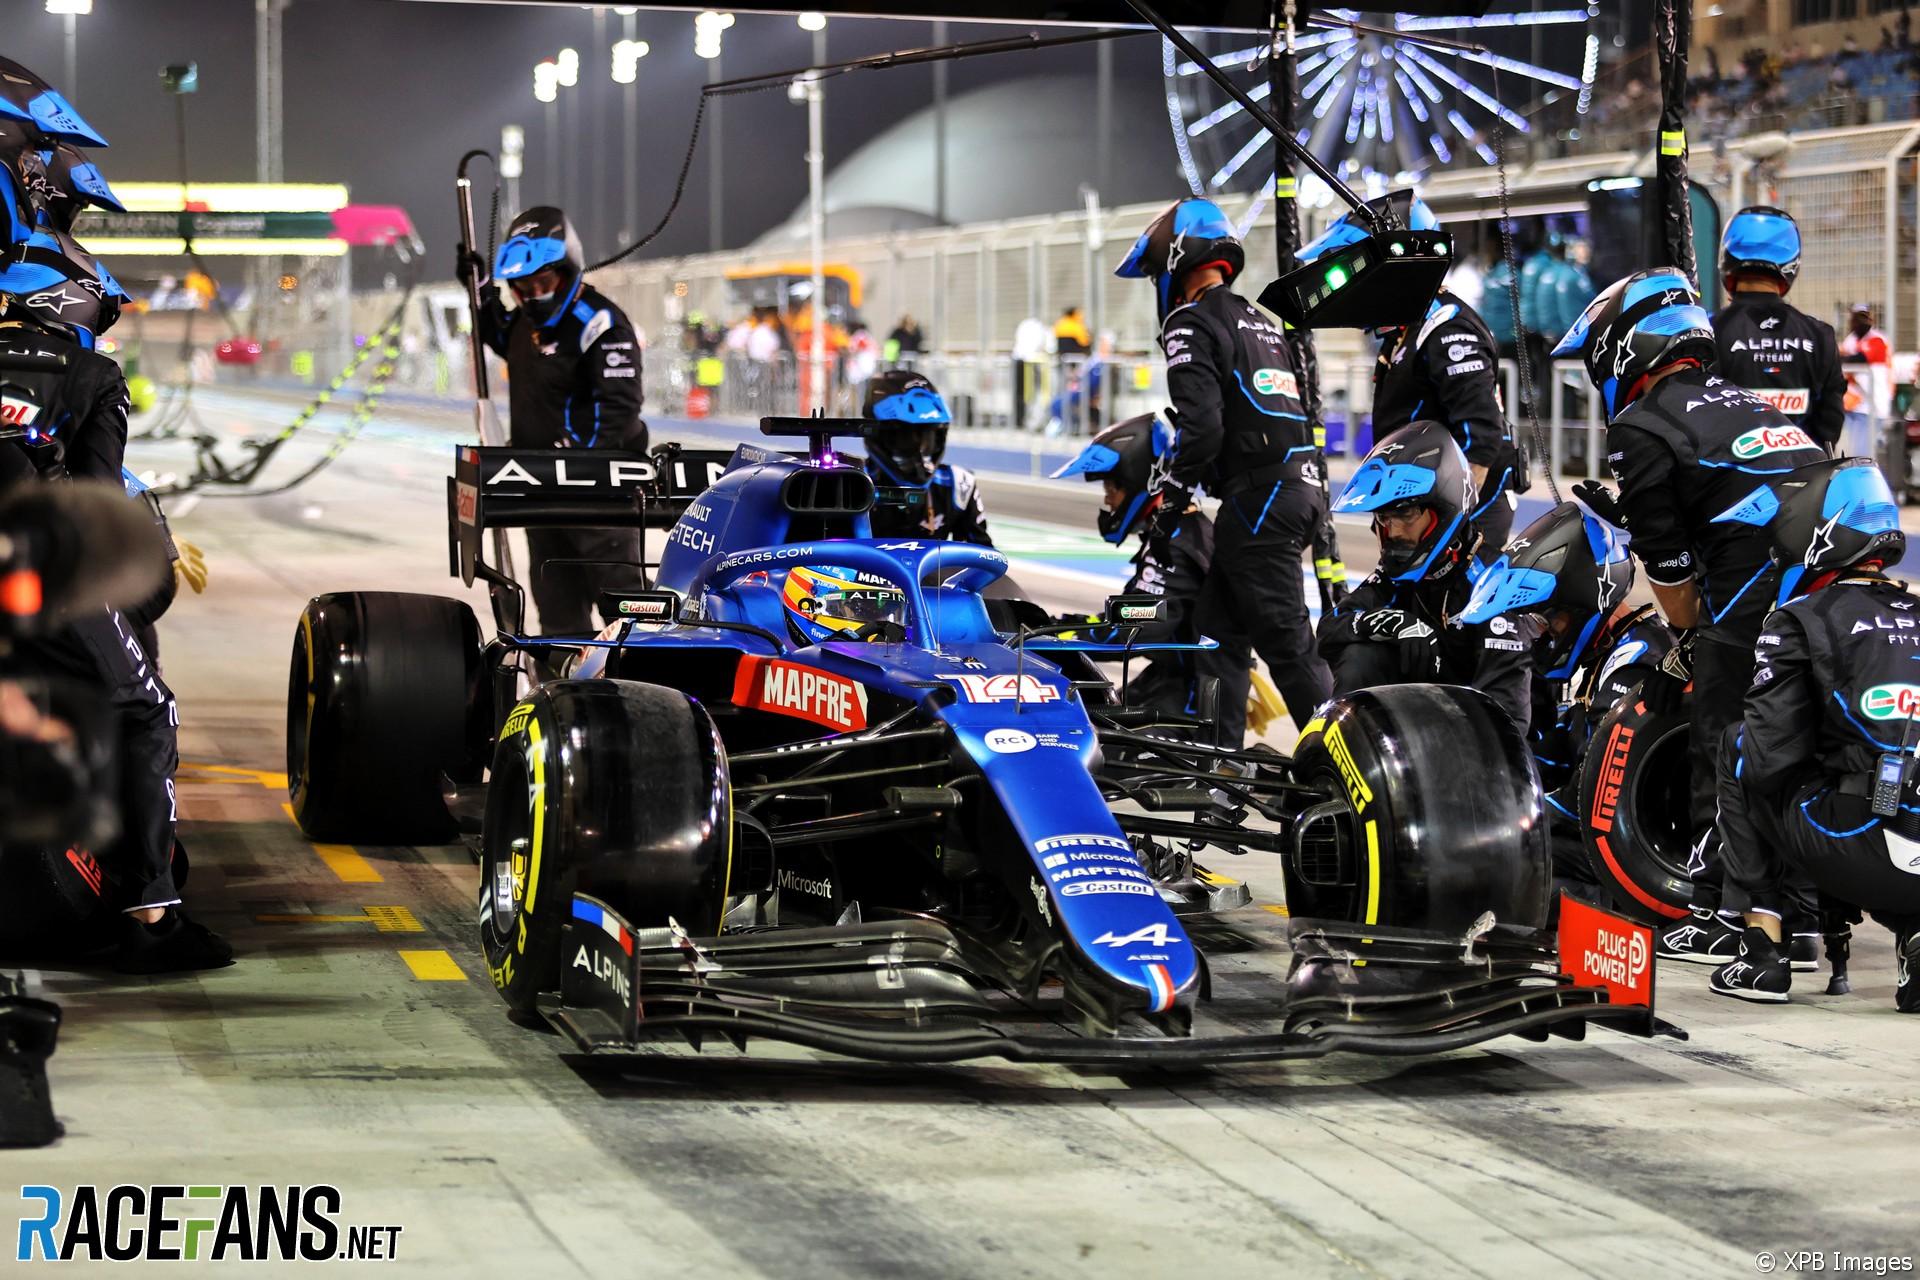 Fernando Alonso, Alpine, Bahrain International Circuit, 2021